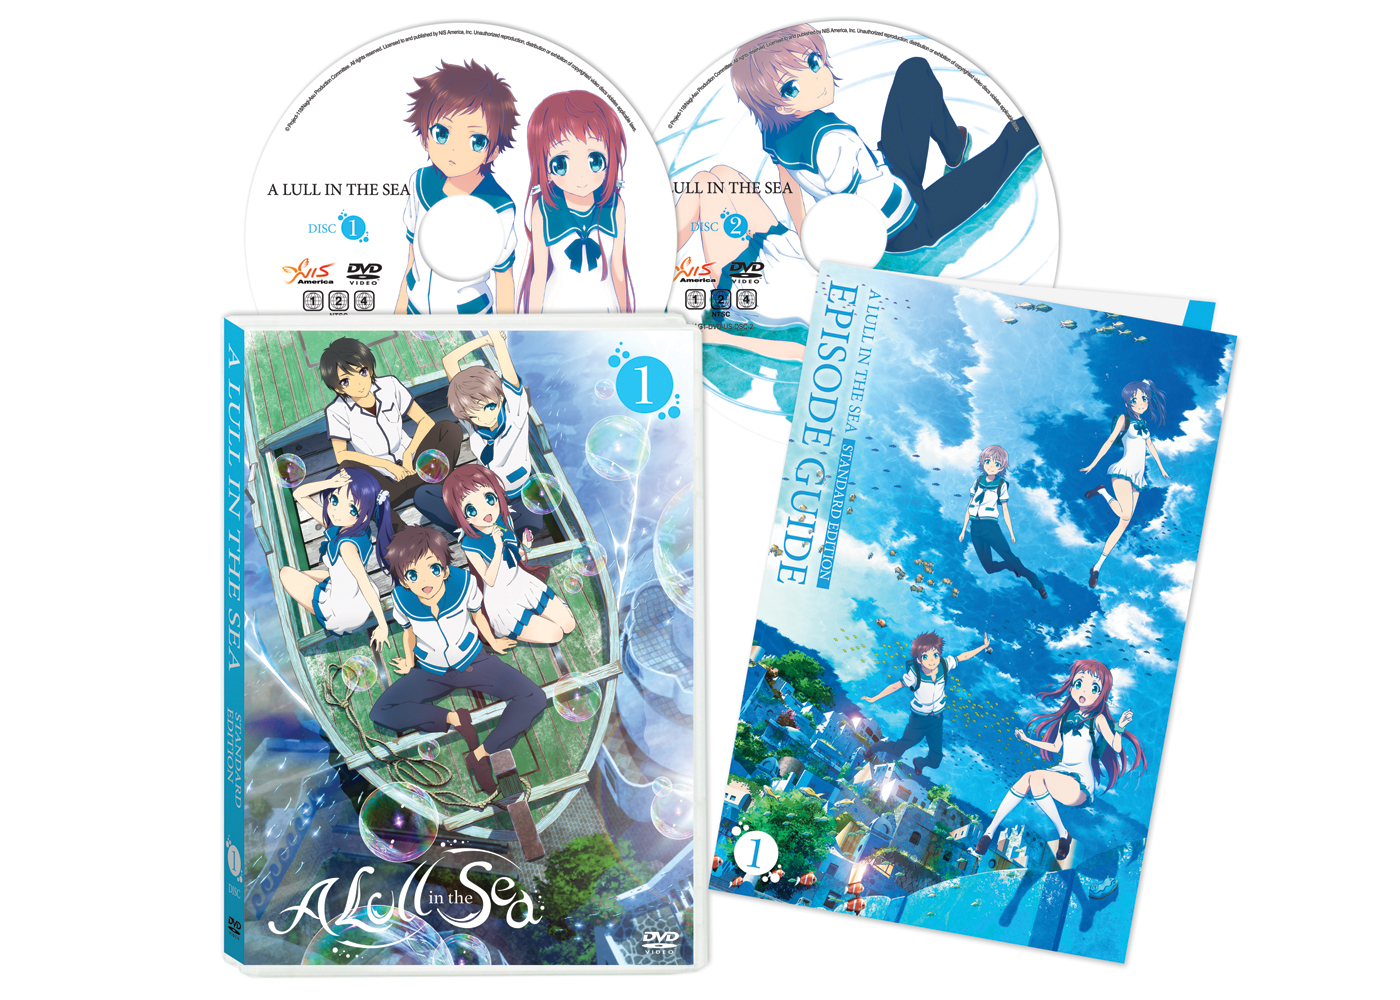 A Lull in the Sea DVD 1 Alt